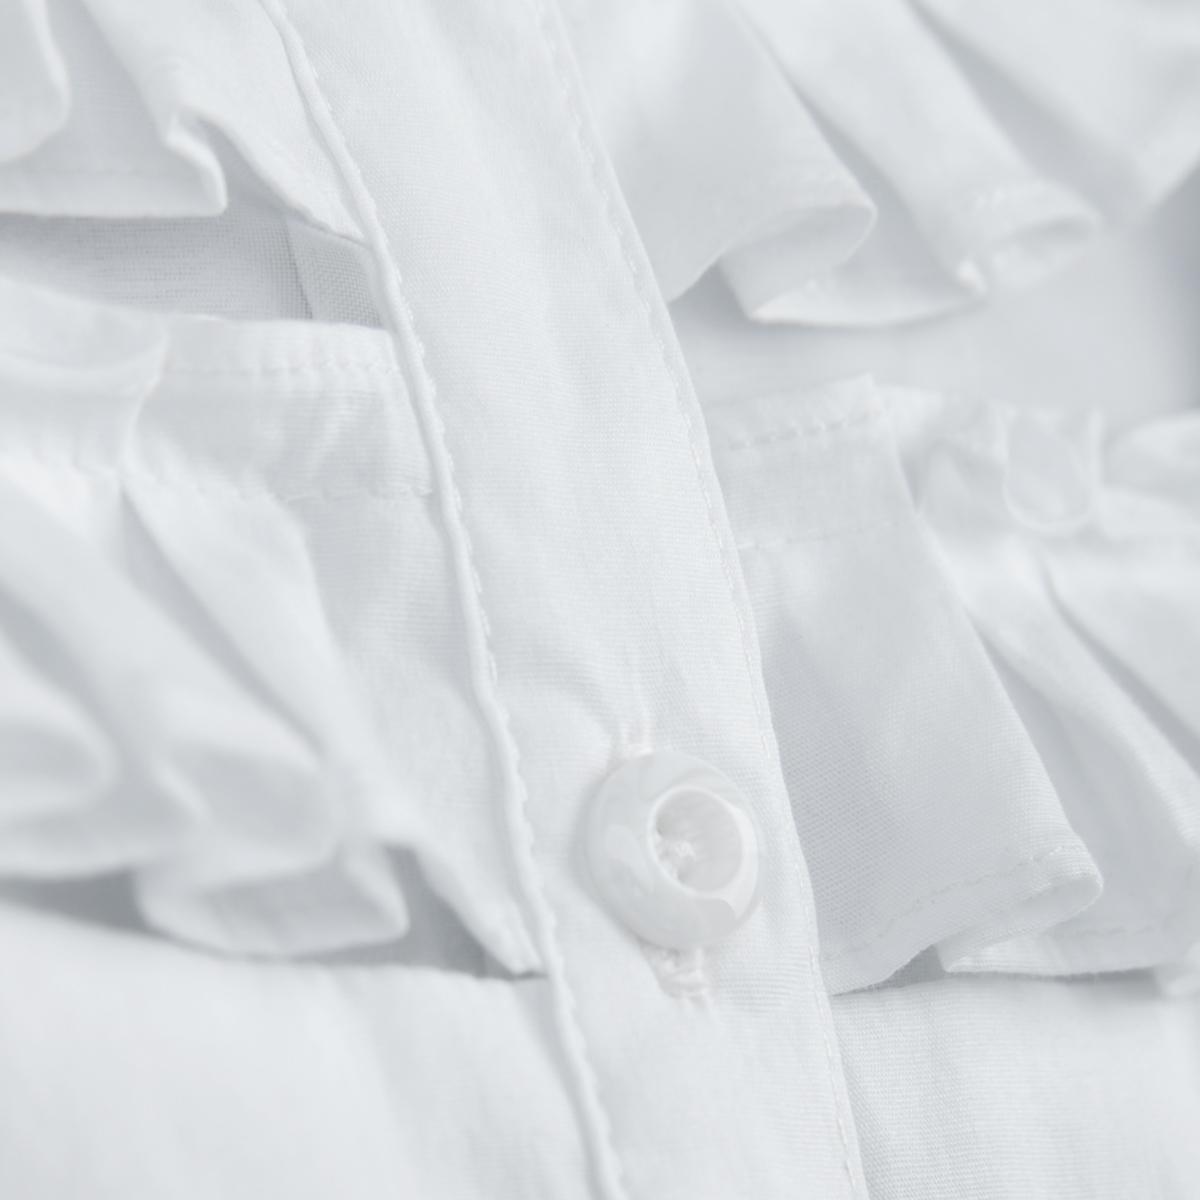 женская рубашка OSA sc00403 O.SA OL Casual Однотонный цвет